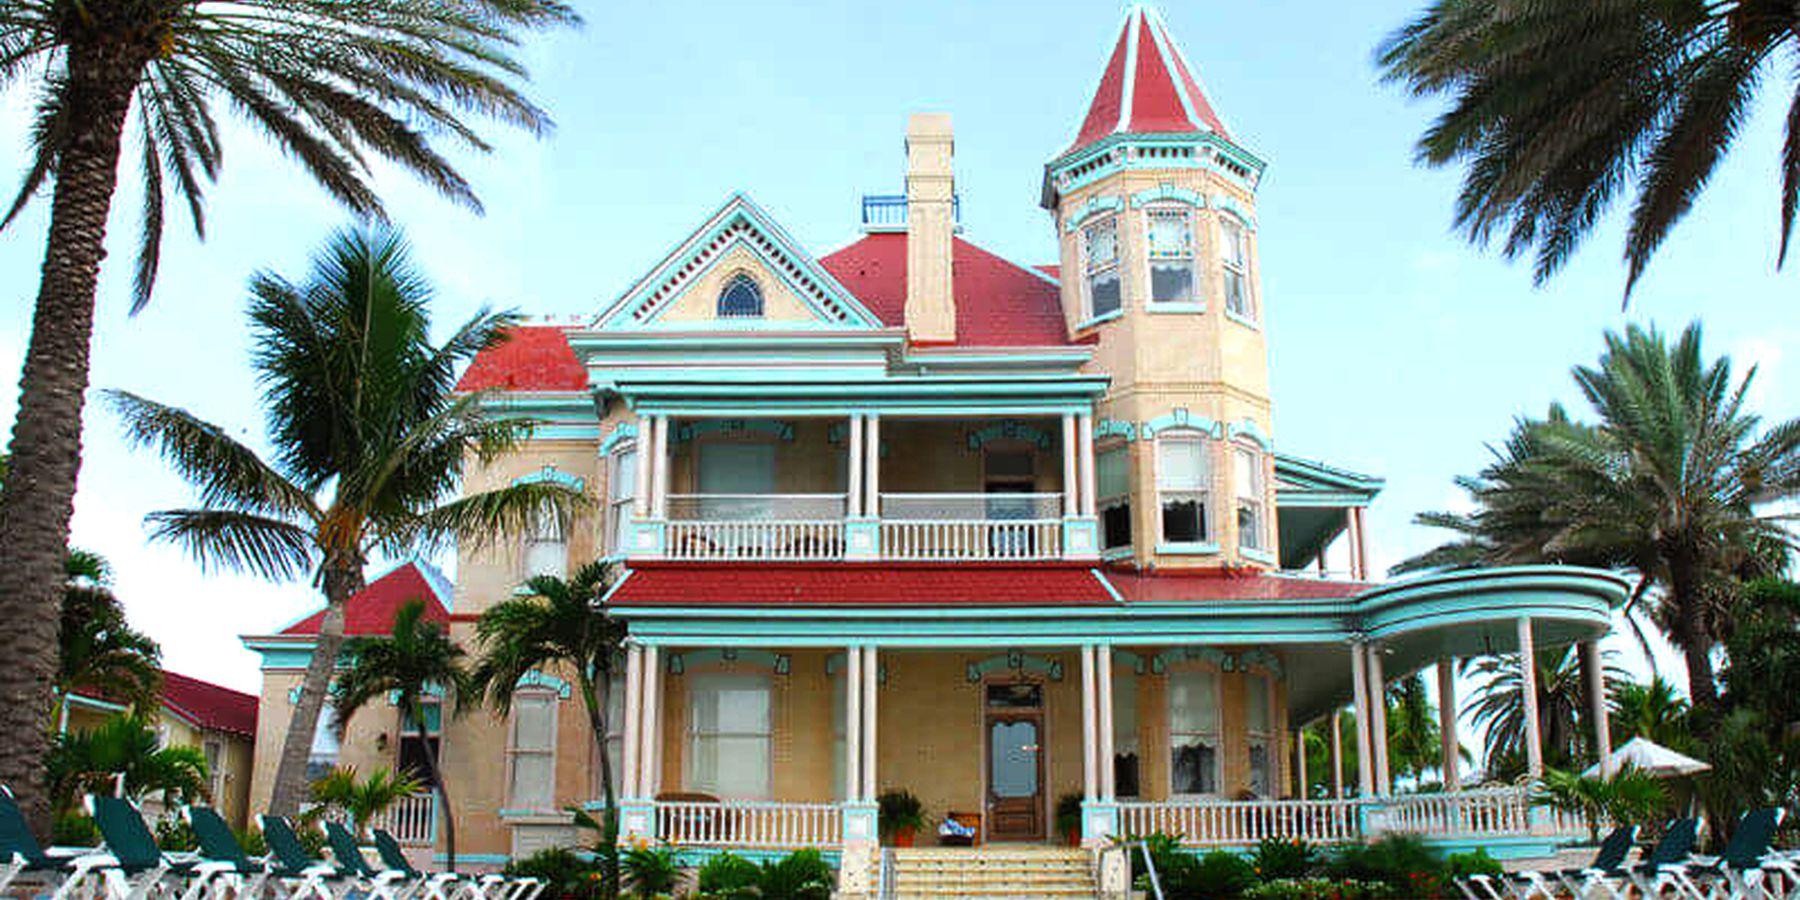 Southern Most House - Key West - The Keys - Florida - Doets Reizen